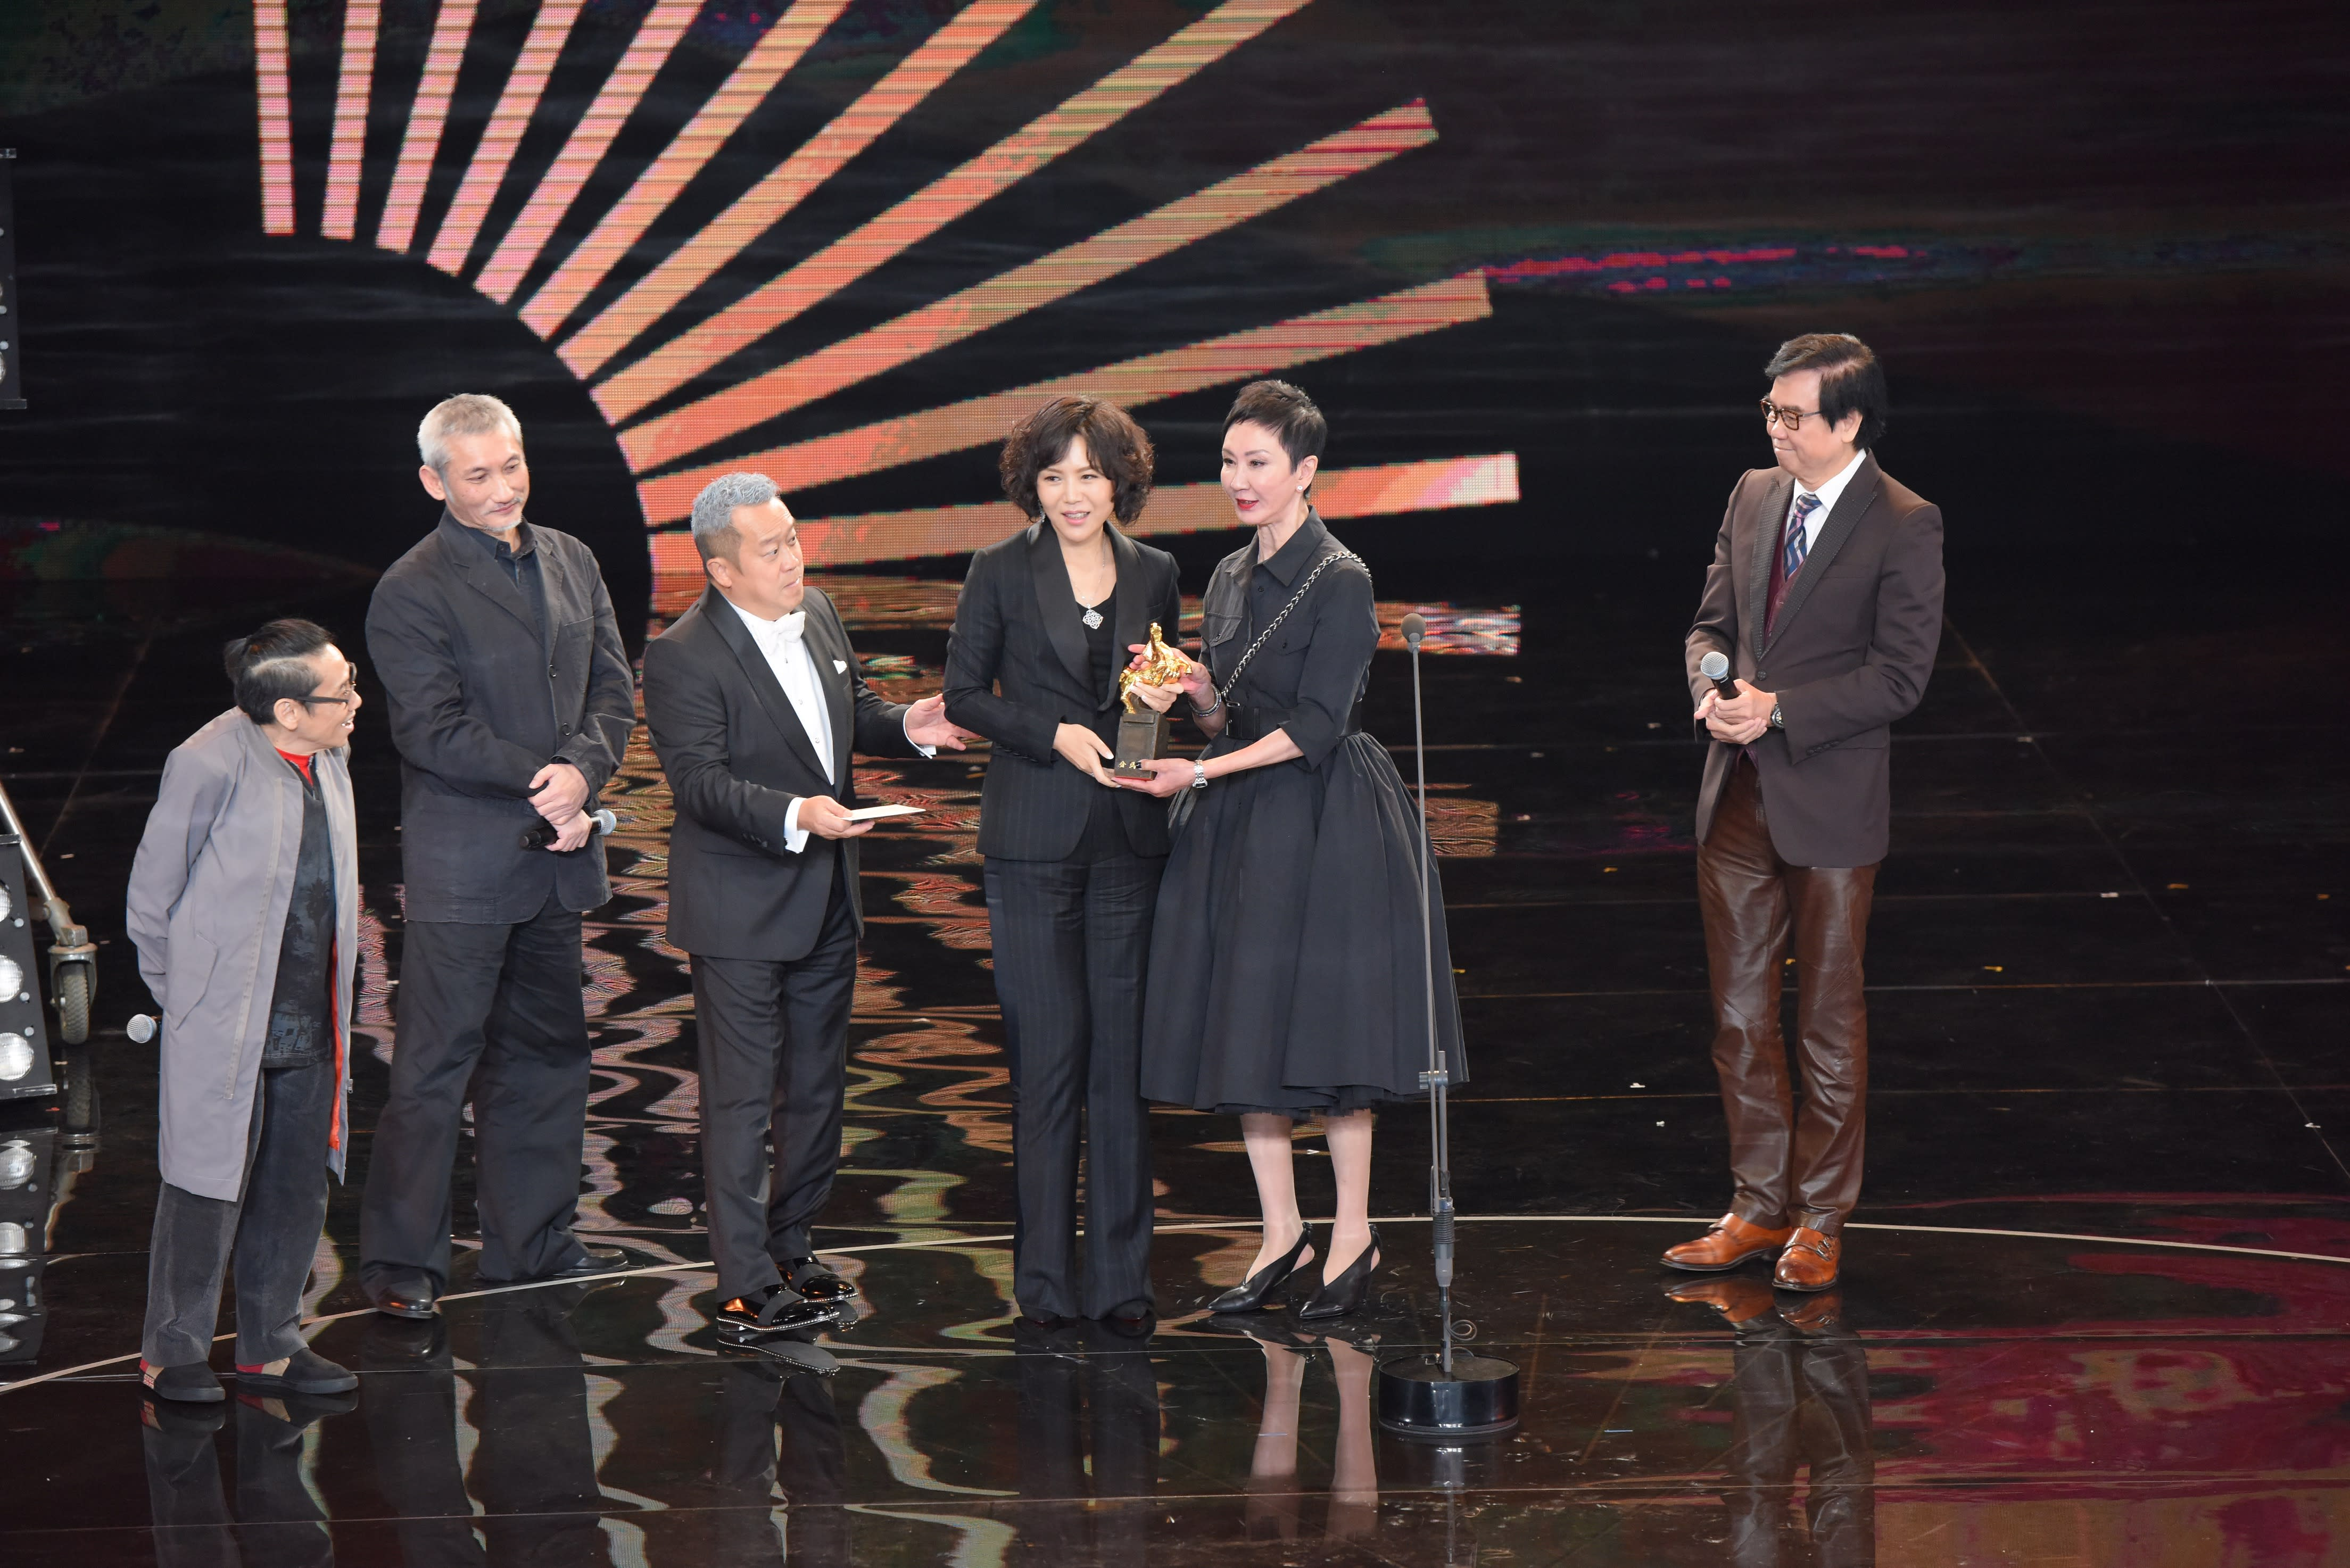 <p>第54屆金馬最佳導演為《嘉年華》文晏,她在得獎感言時幽默地說:「這樣《嘉年華》不需要抽籤,就可以在台灣上映。」(影像:金馬執委會提供) </p>